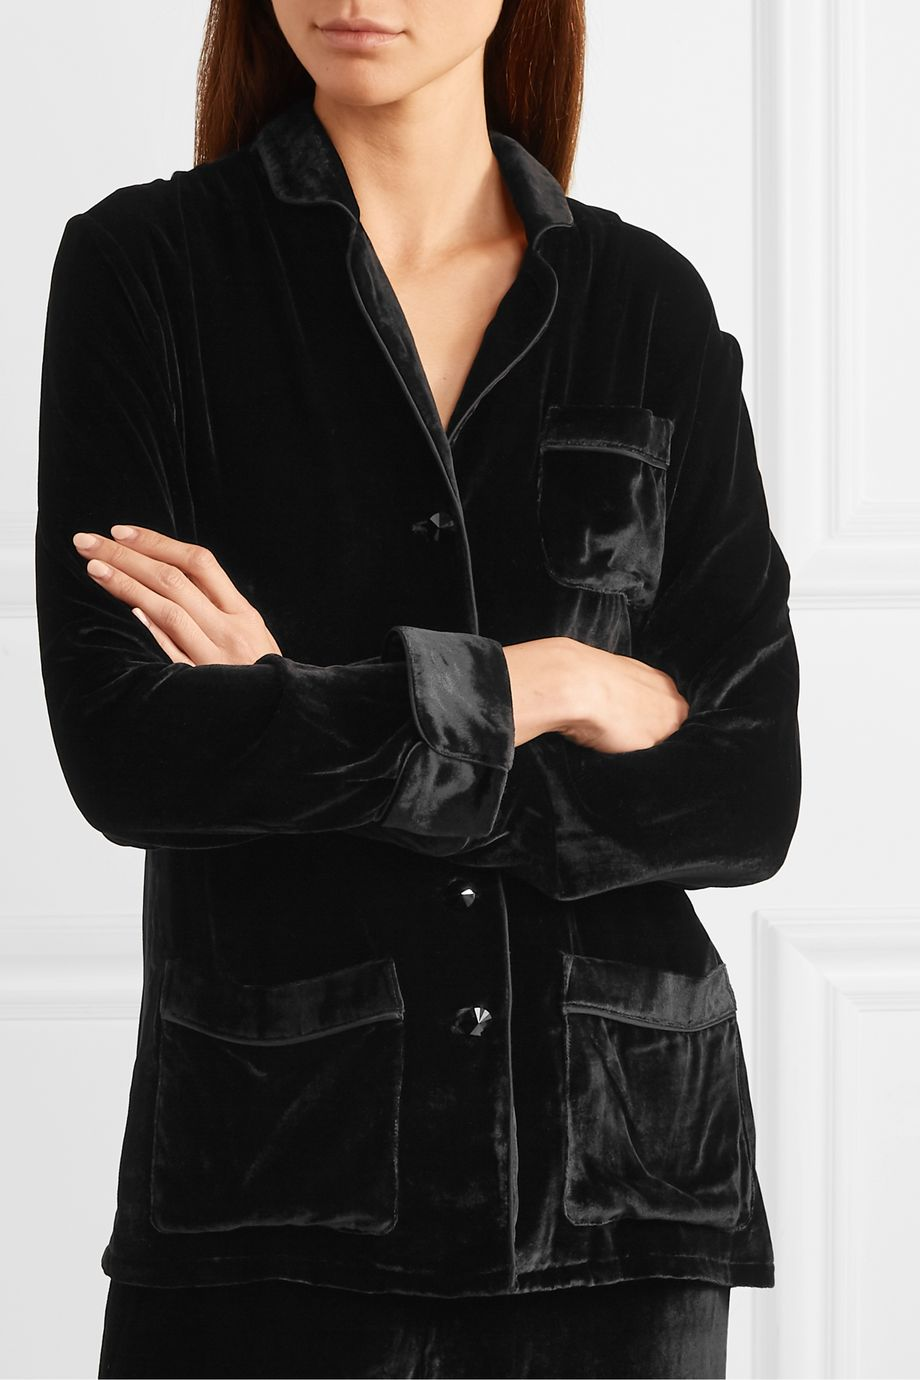 Olivia von Halle + Maleficent Coco sequin-embellished embroidered velvet pajama set